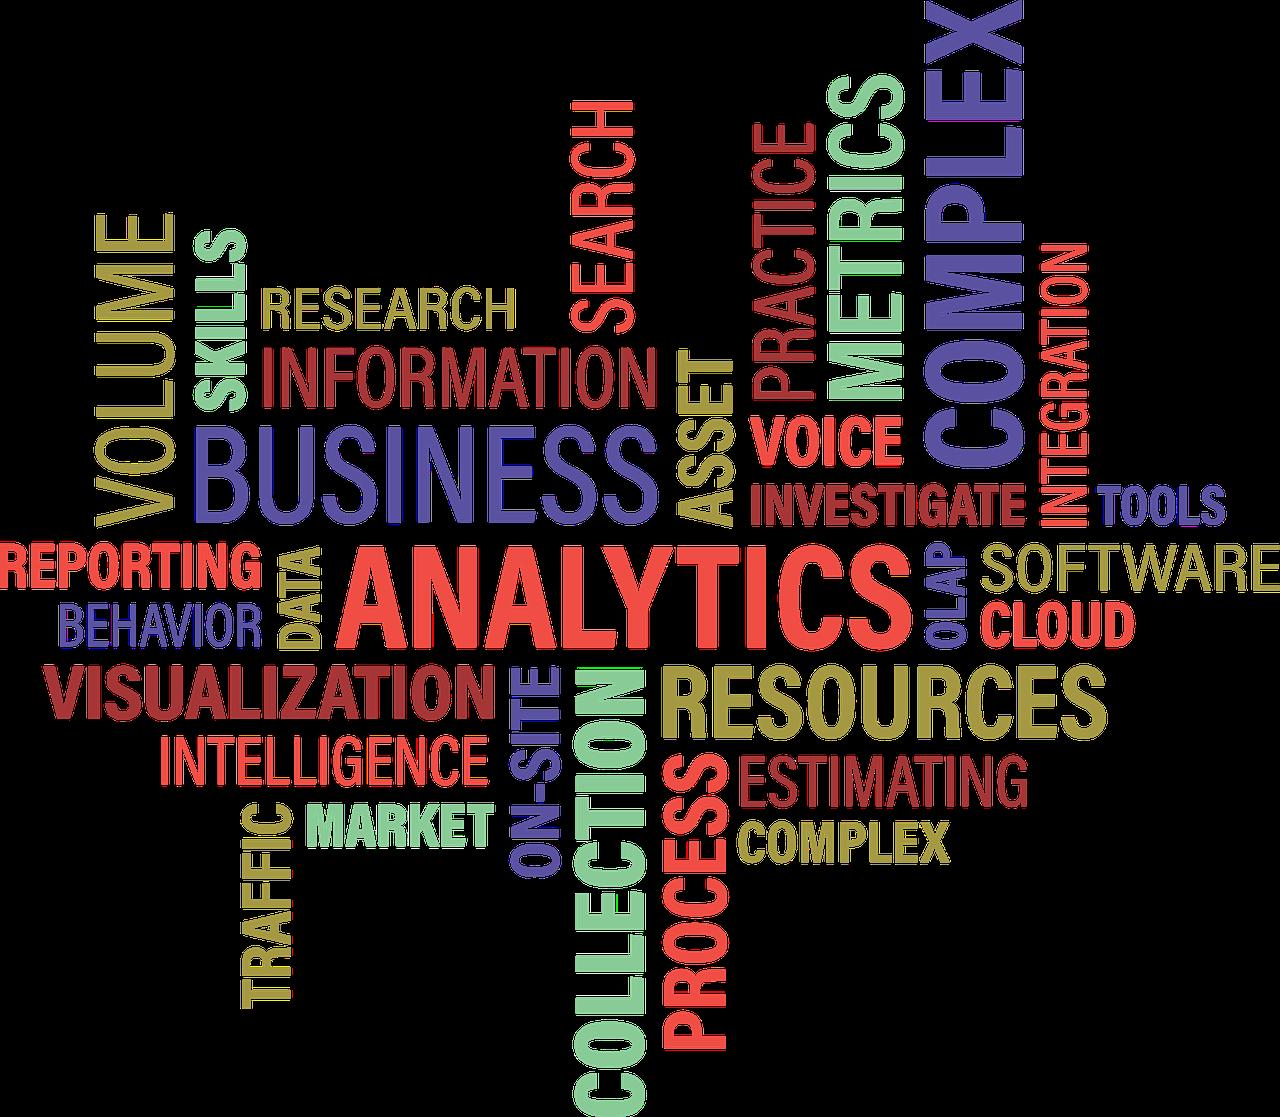 analytics-business-resources